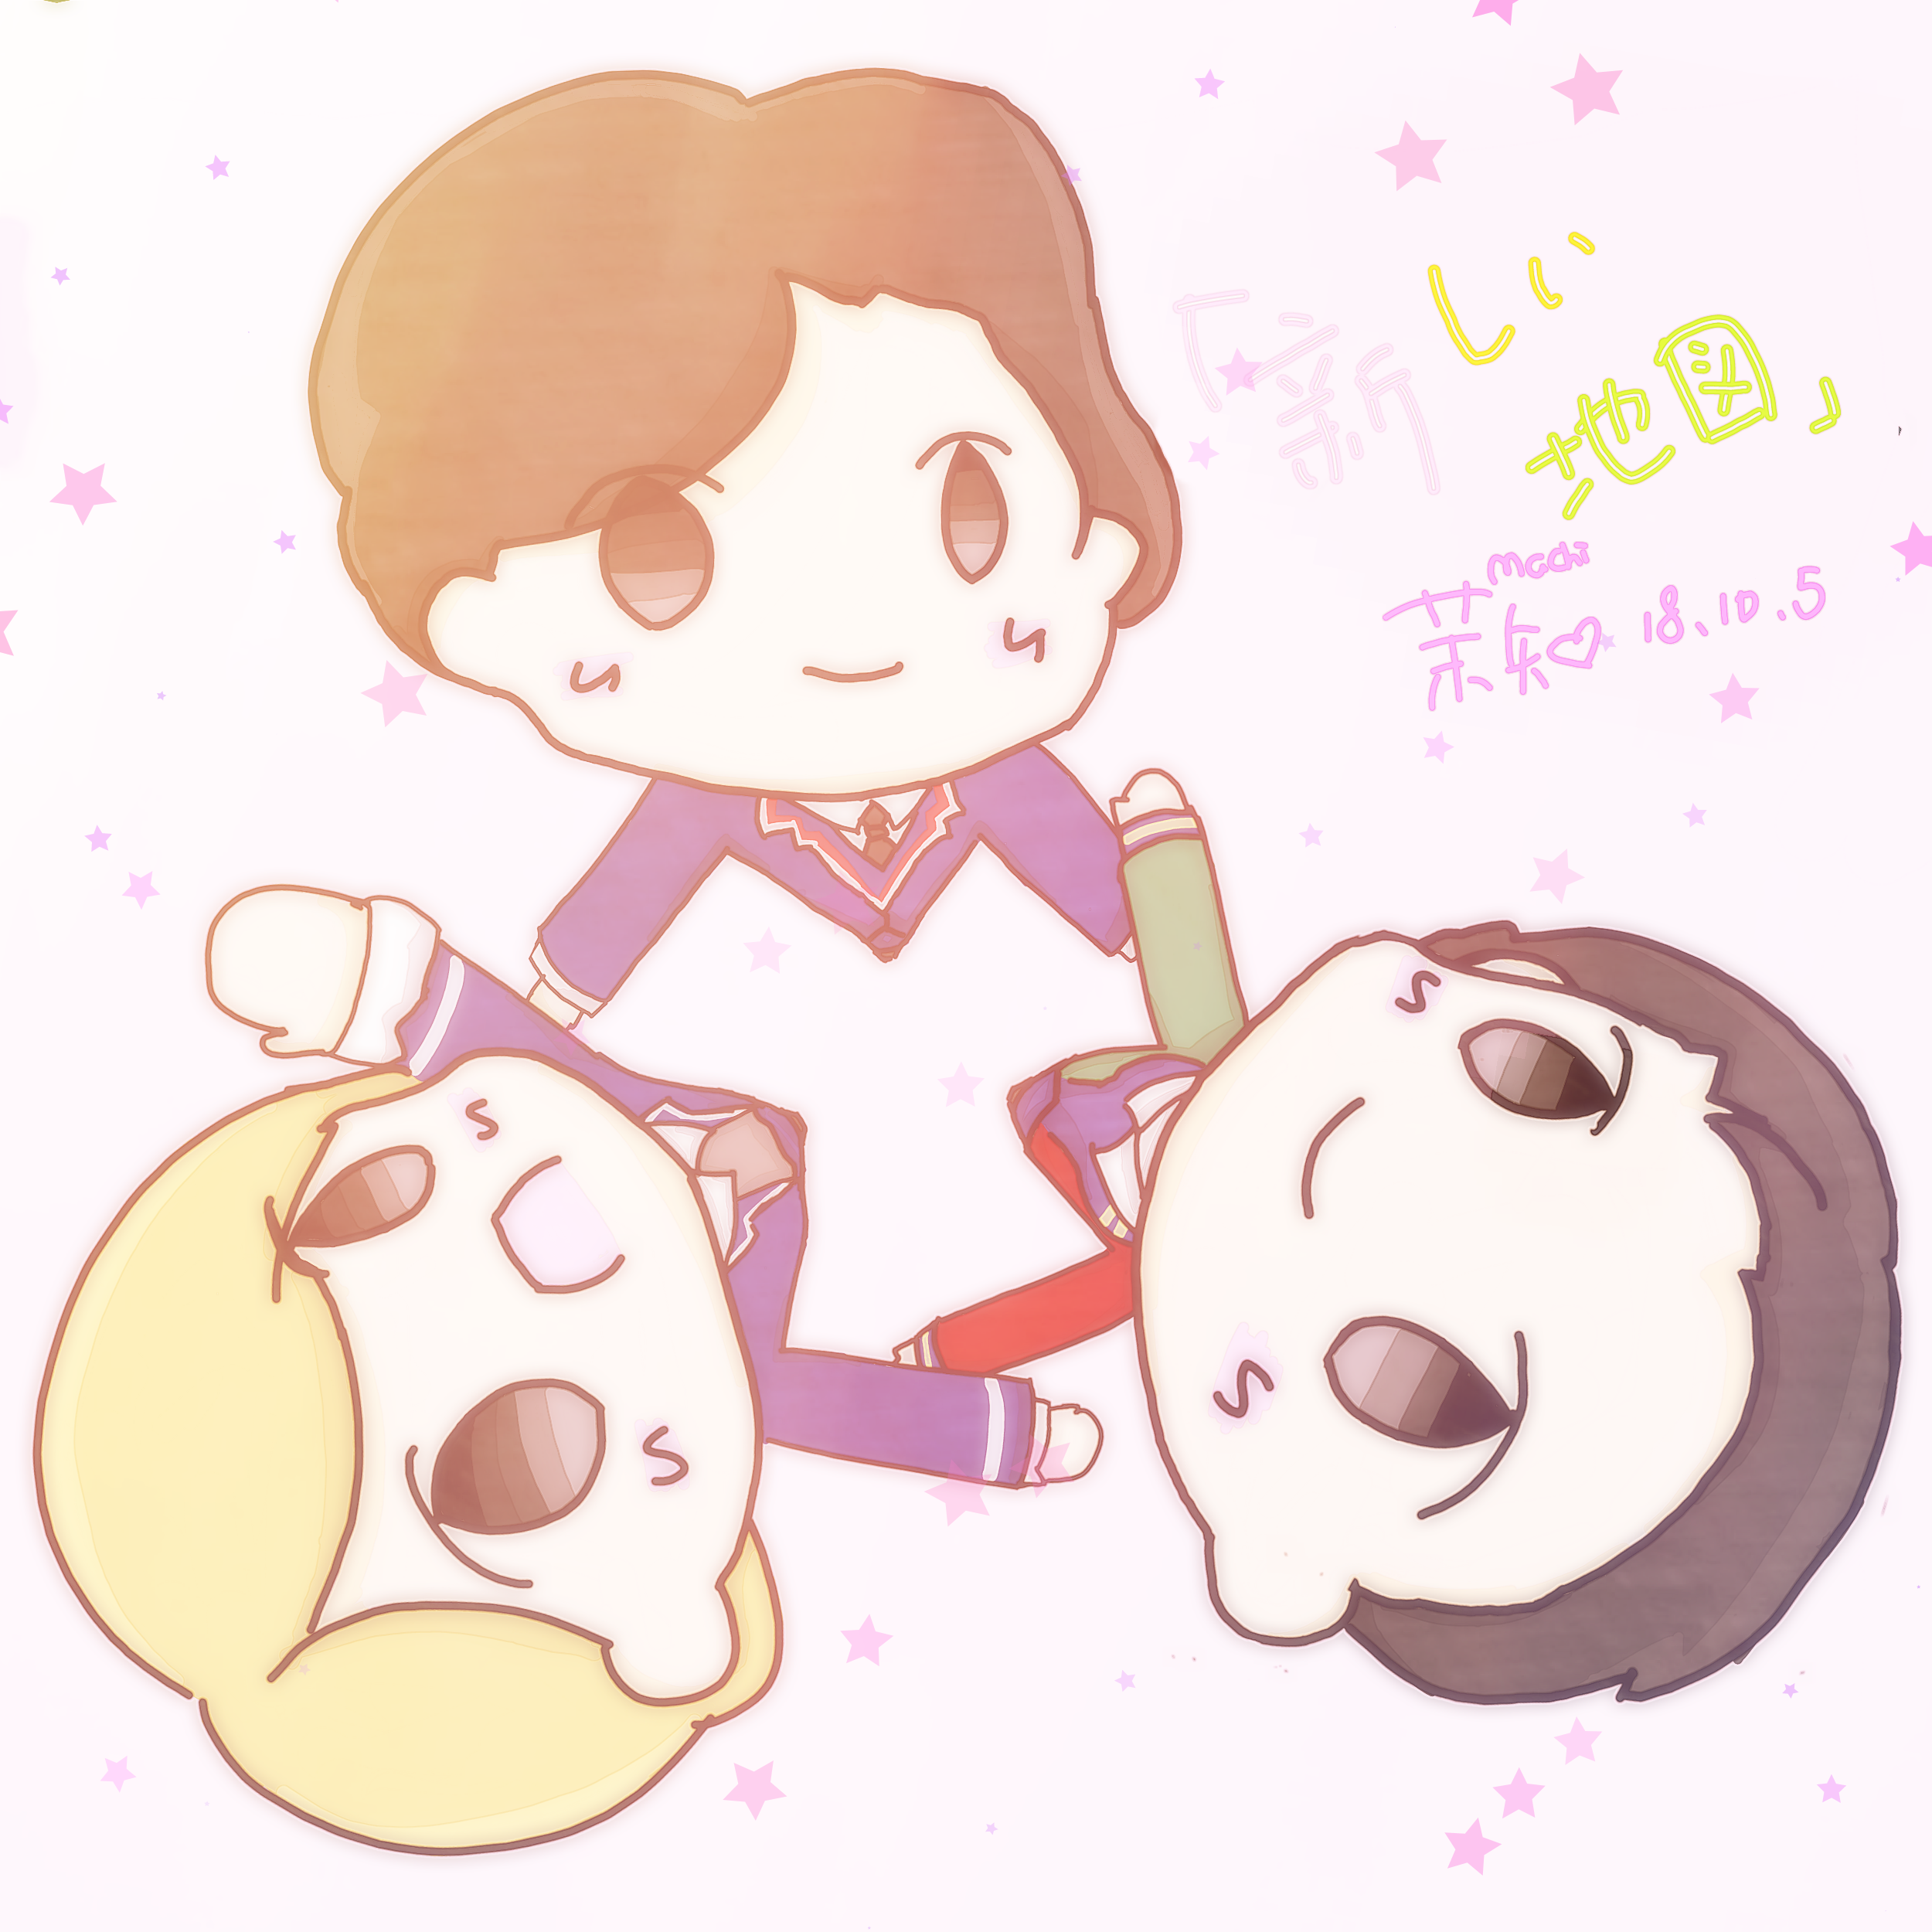 撸日日撸momo44com